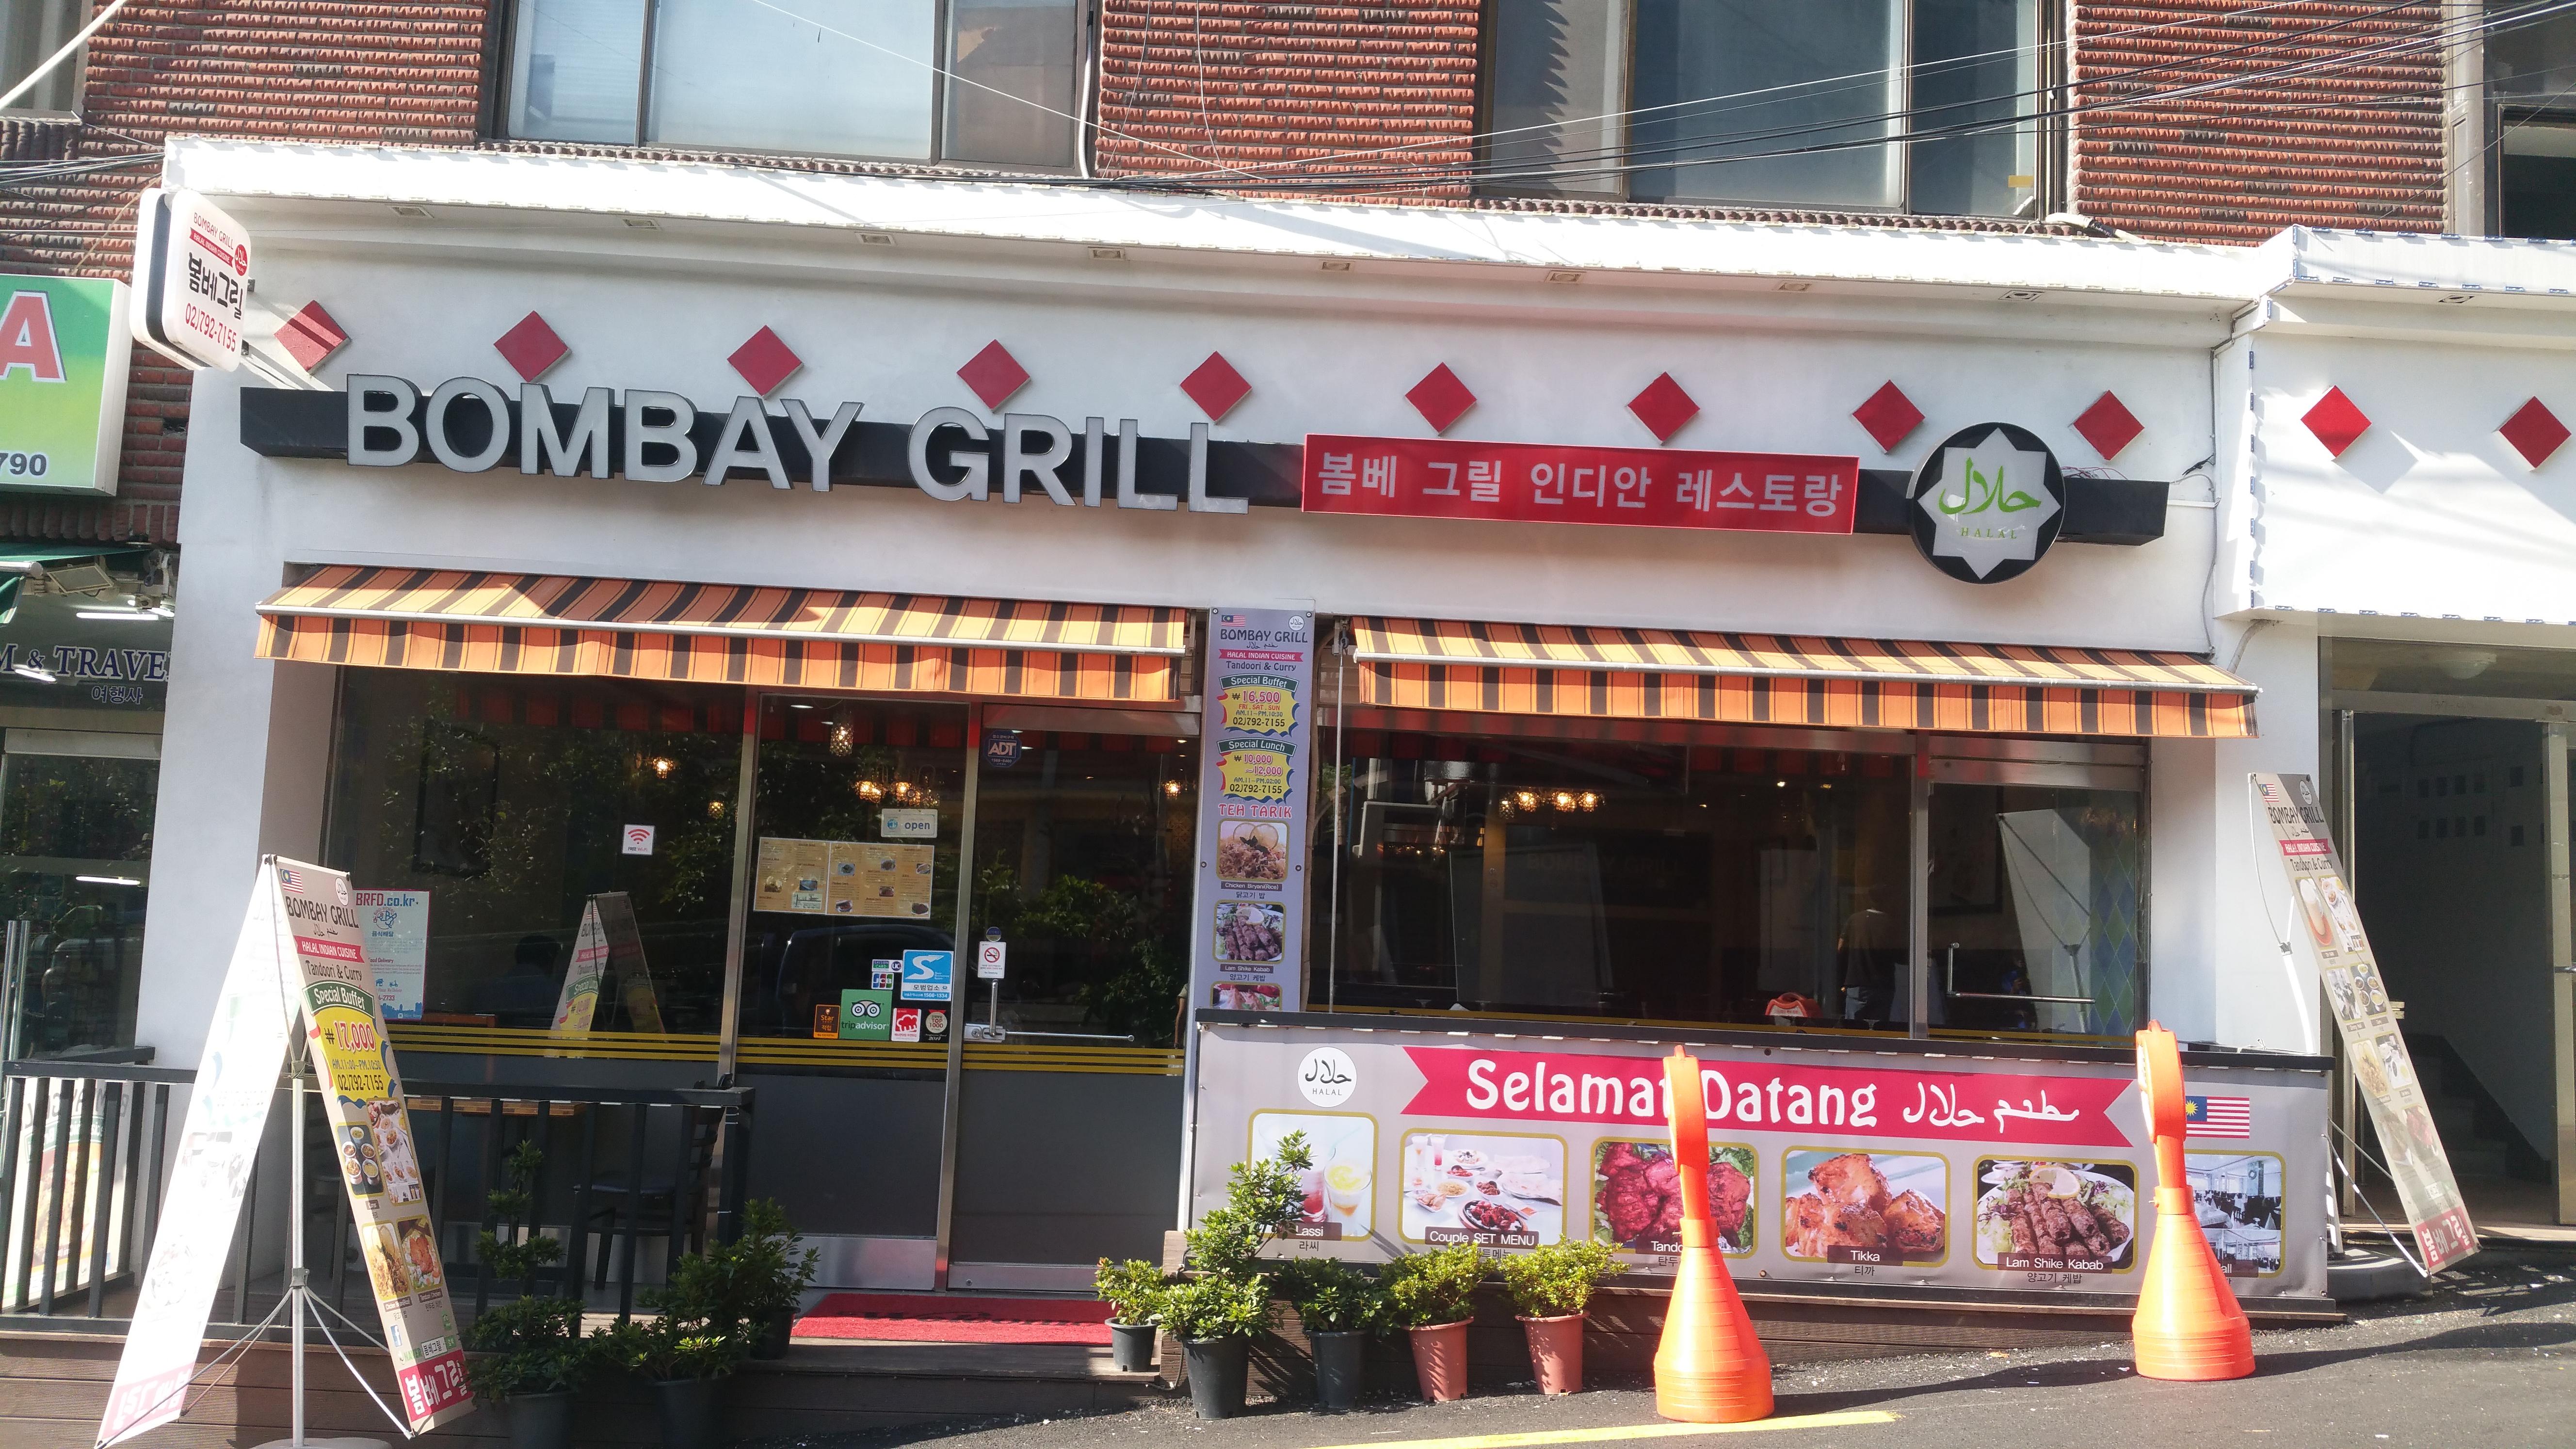 Bombay Grill [Halal]